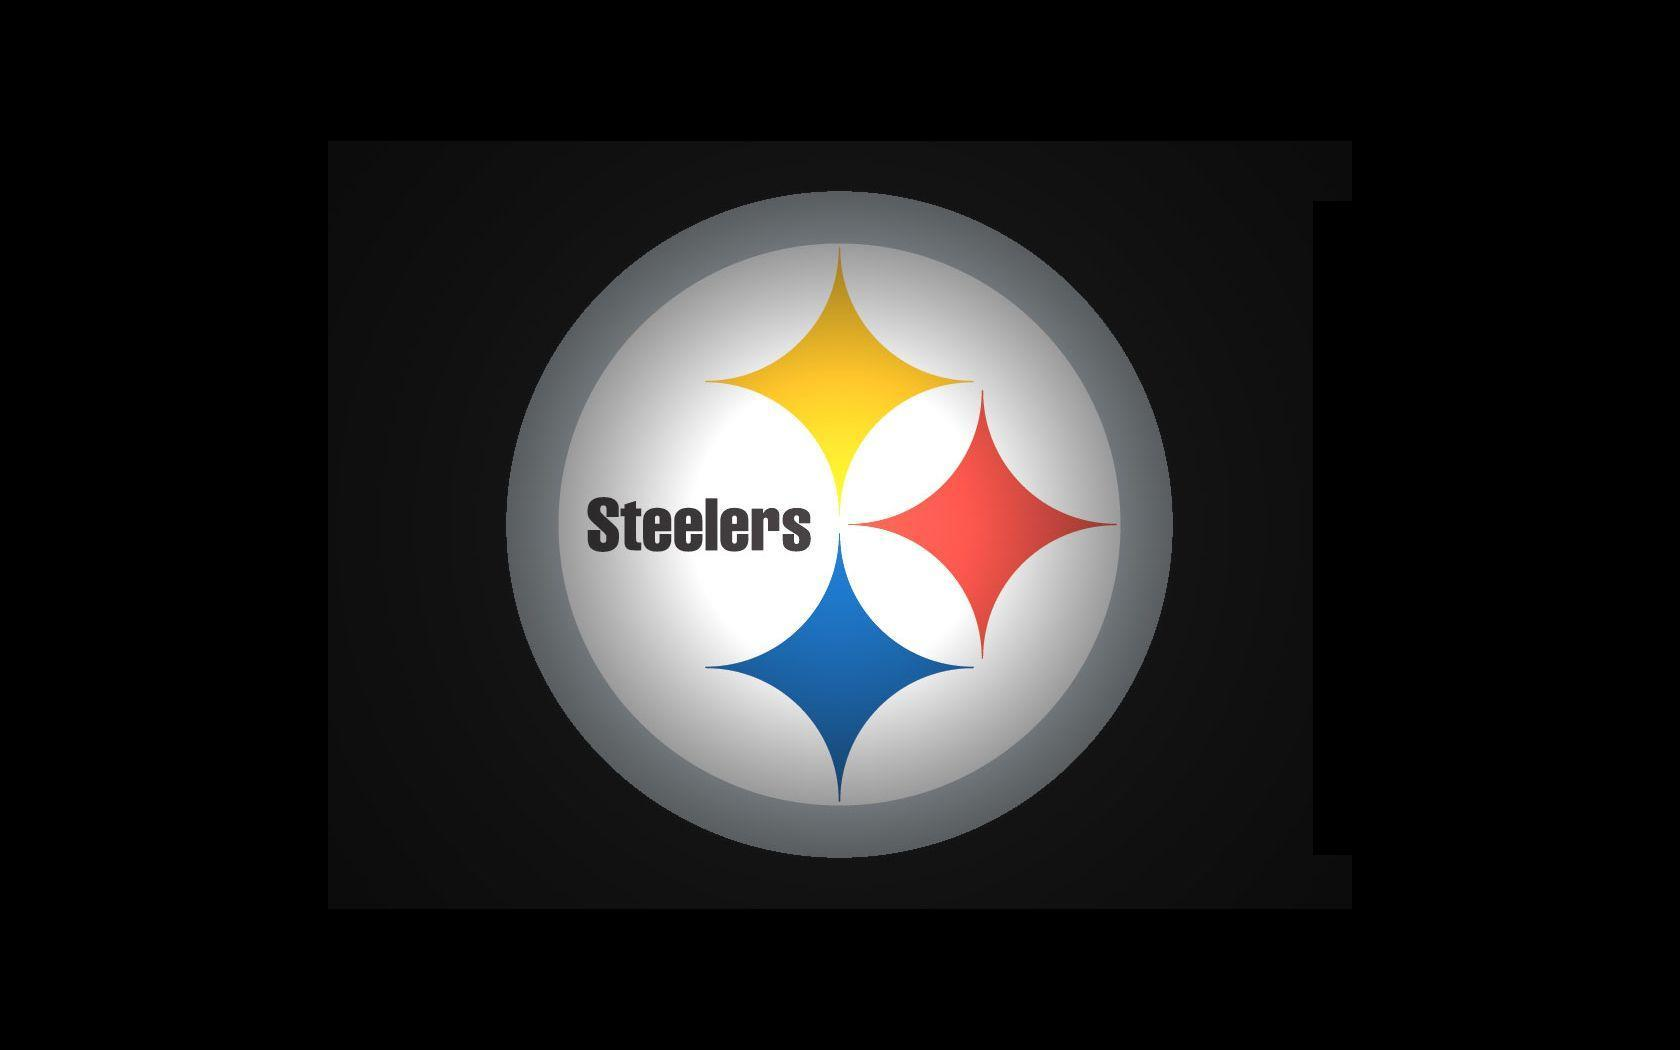 Steelers wallpaper | 1680x1050 | #54227